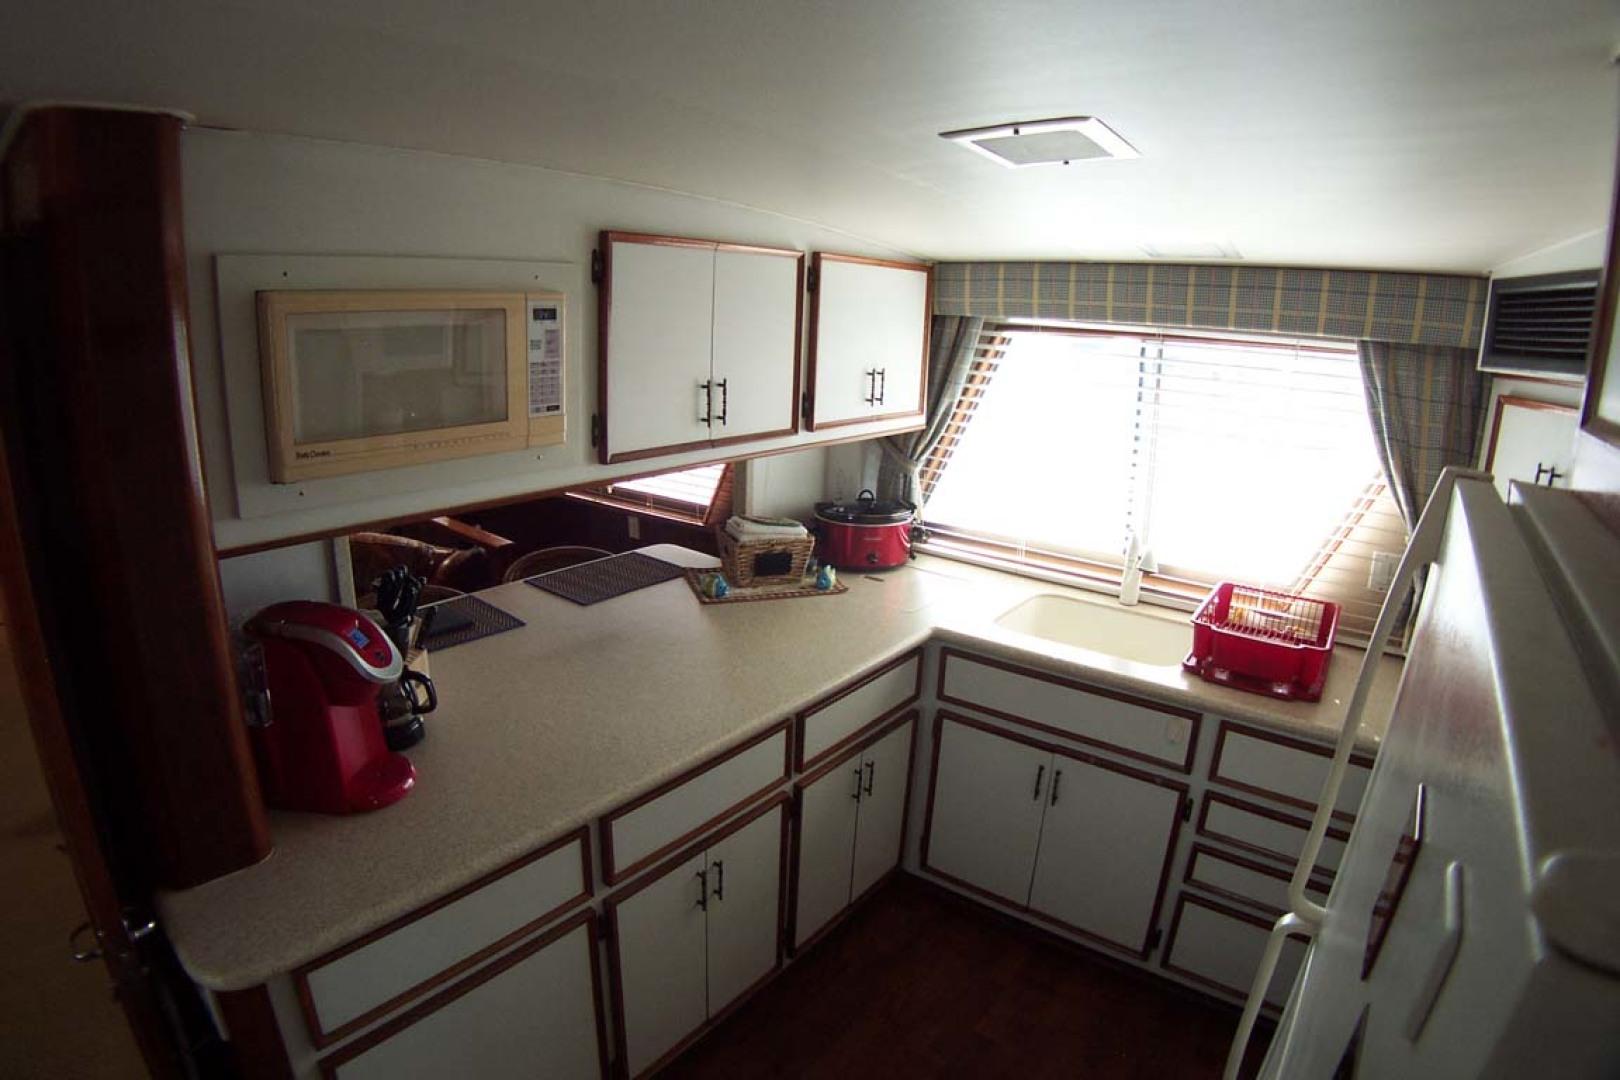 Hatteras-61 Motoryacht 1980-Piece A Cake Ft. Pierce-Florida-United States-Galley Portside-1094507 | Thumbnail